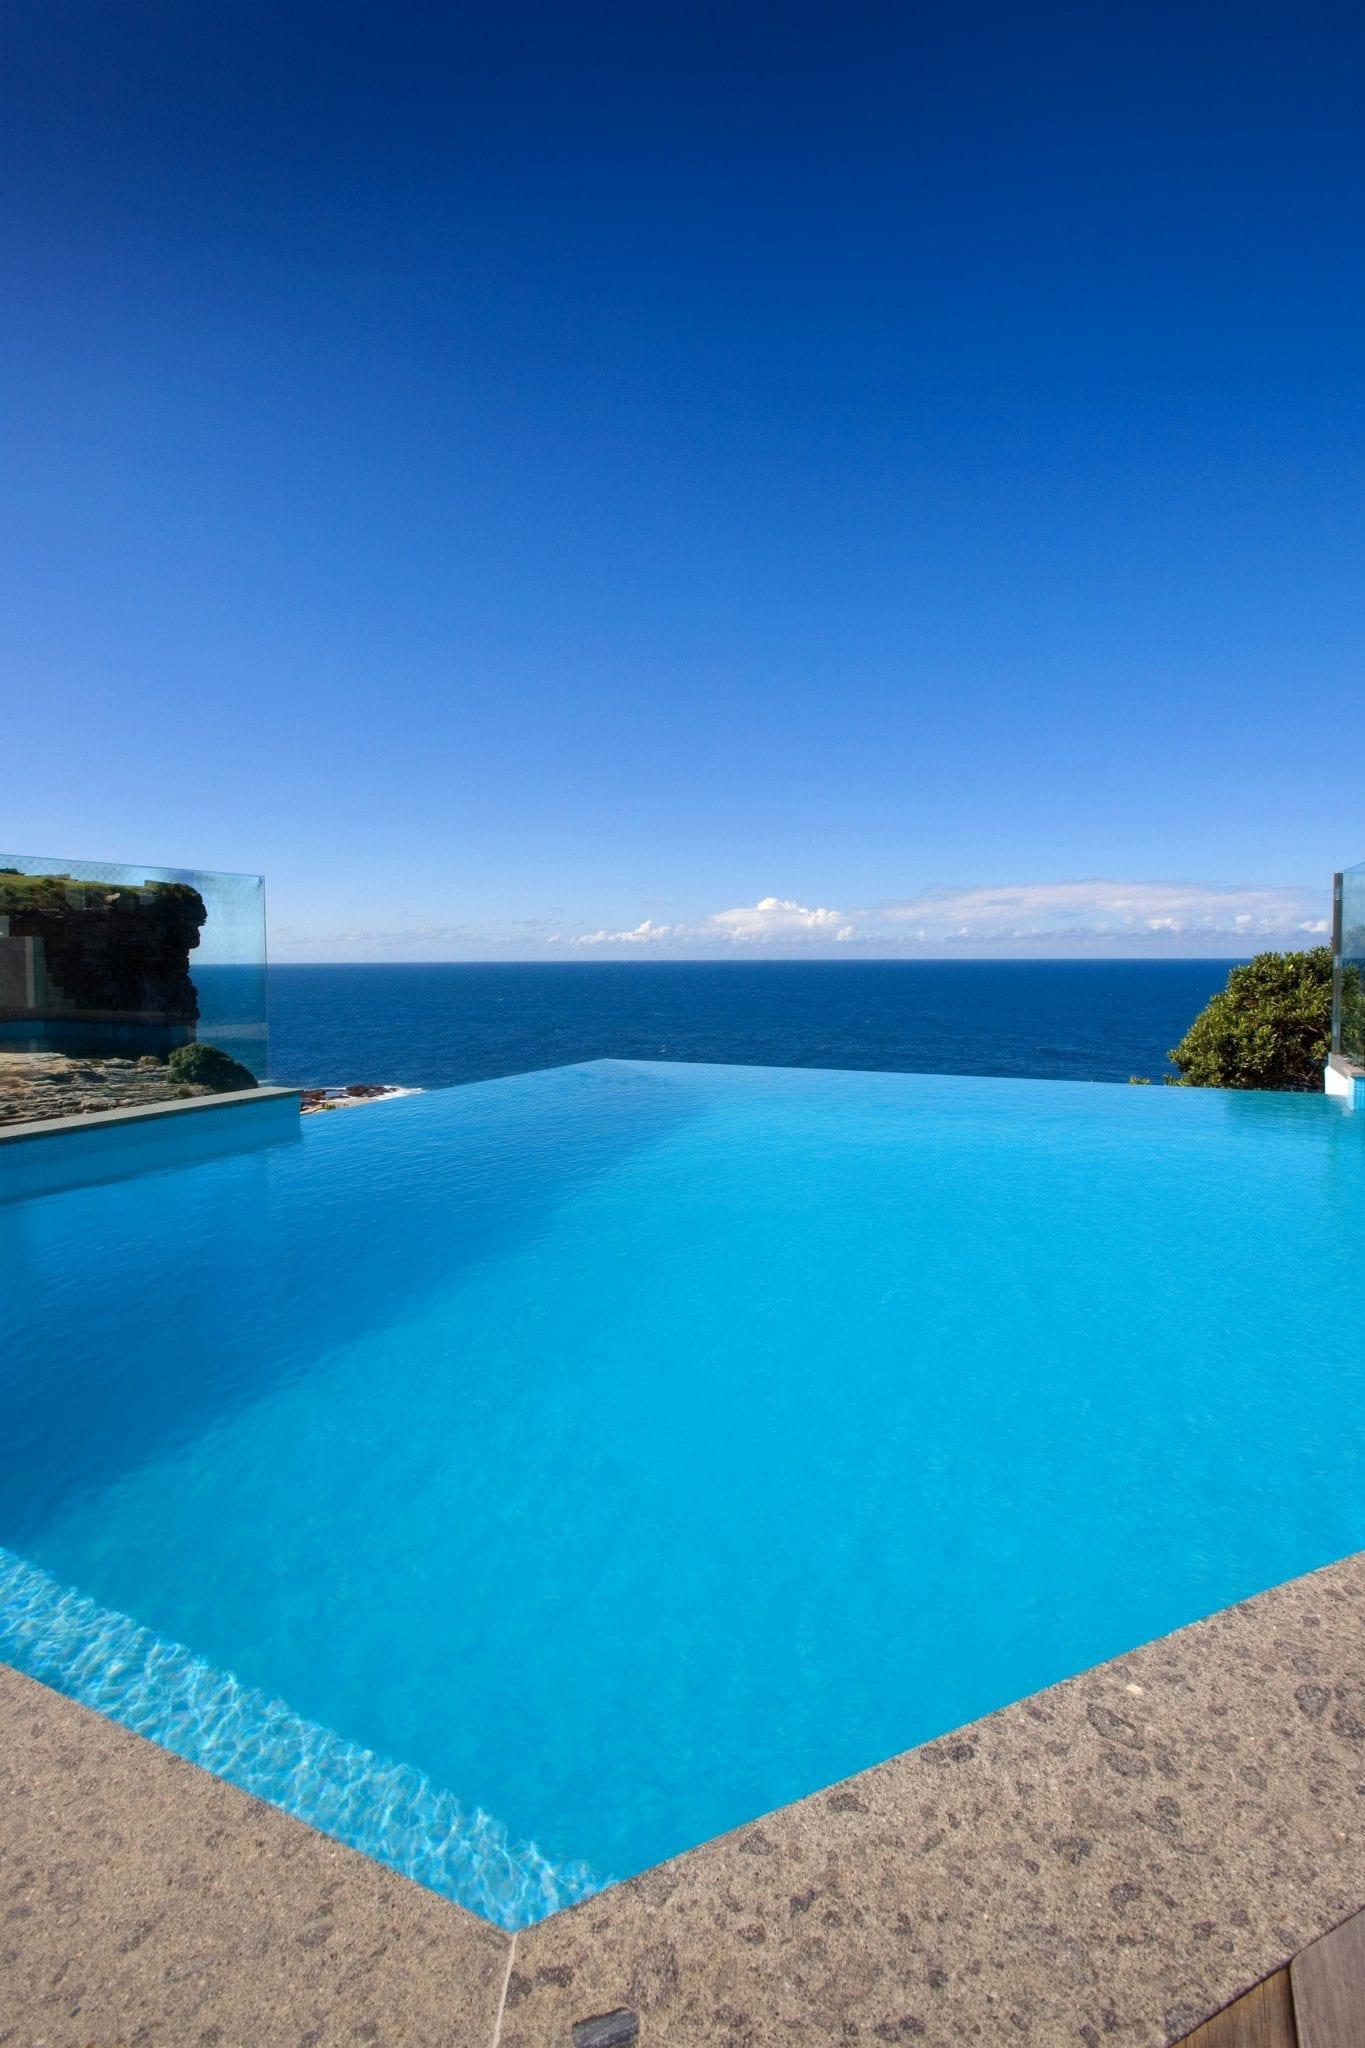 Private Residence, Vaucluse, Sydney - Australia